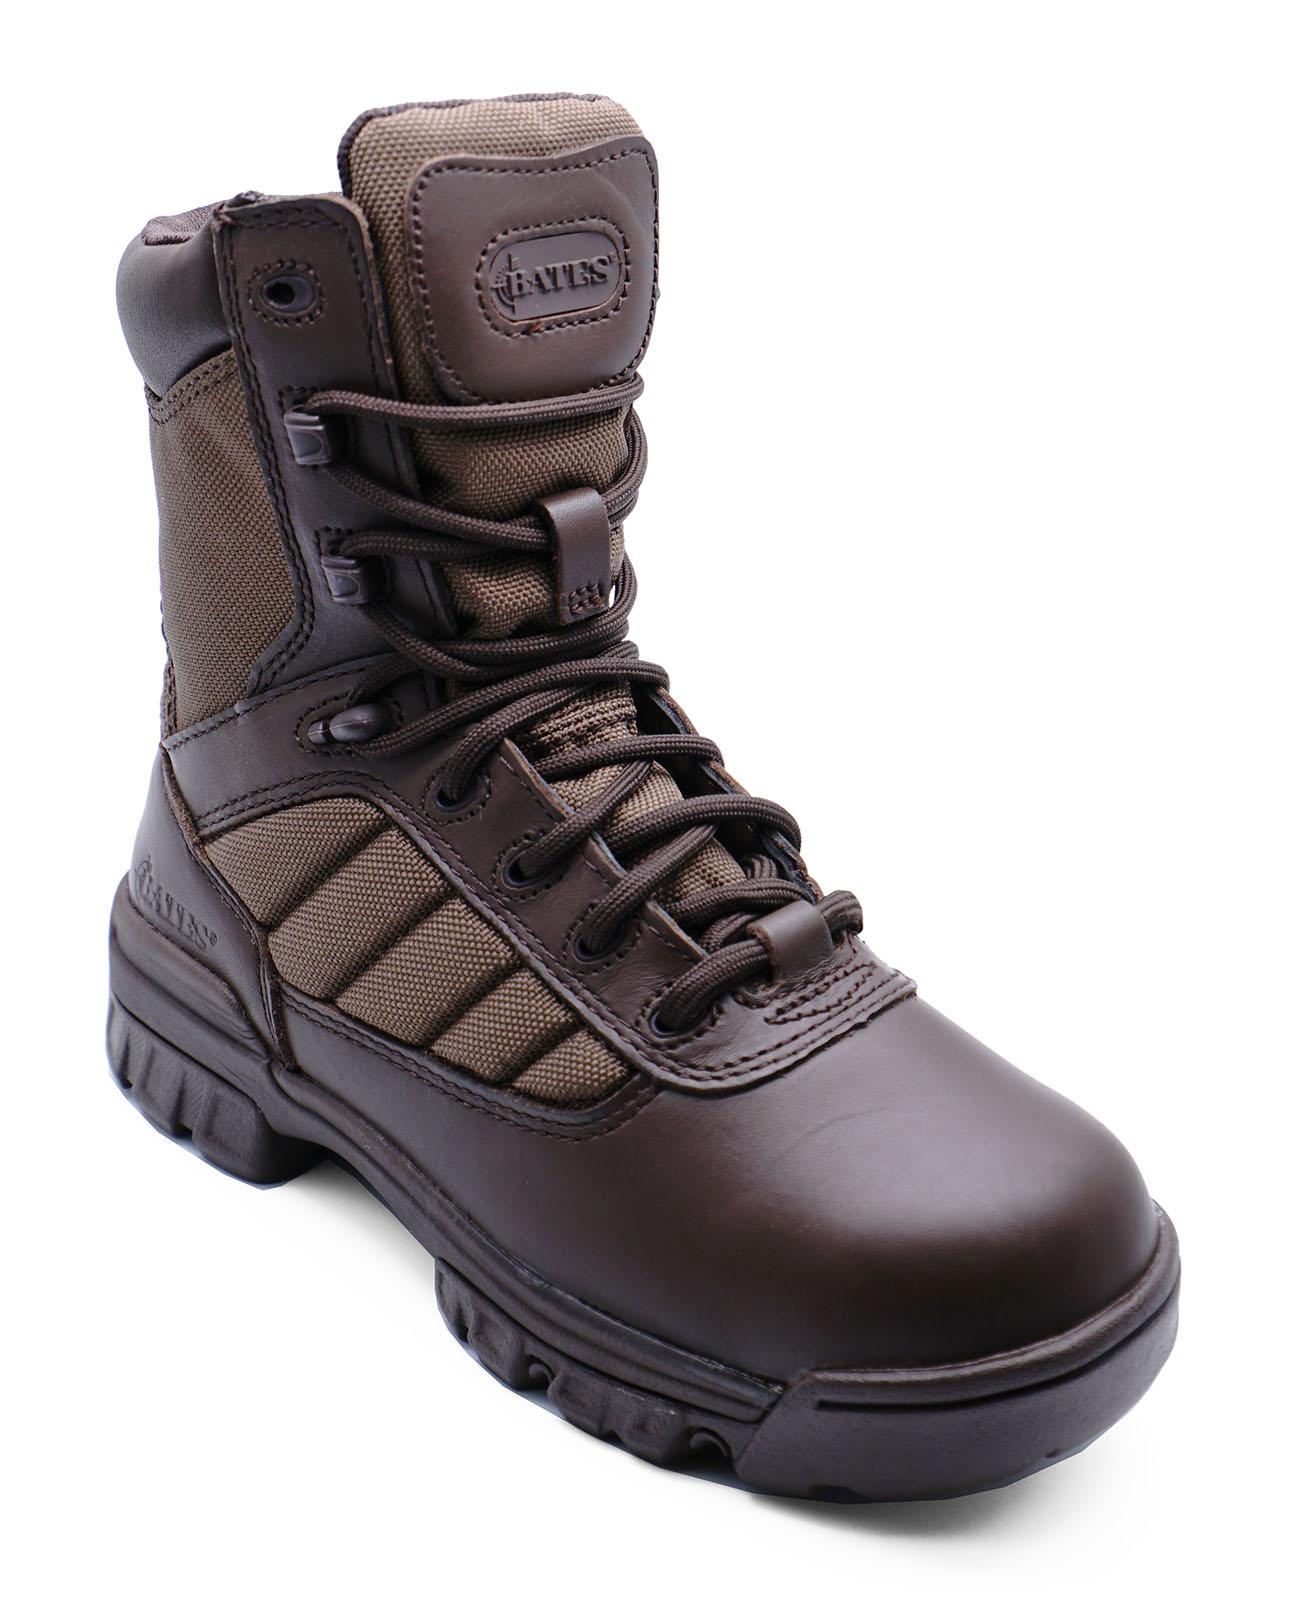 Senoras-Bates-8-034-Tactical-Deporte-Ejercito-Cuero-Patrulla-Combate-Militar-Botas-Talla-3 miniatura 4